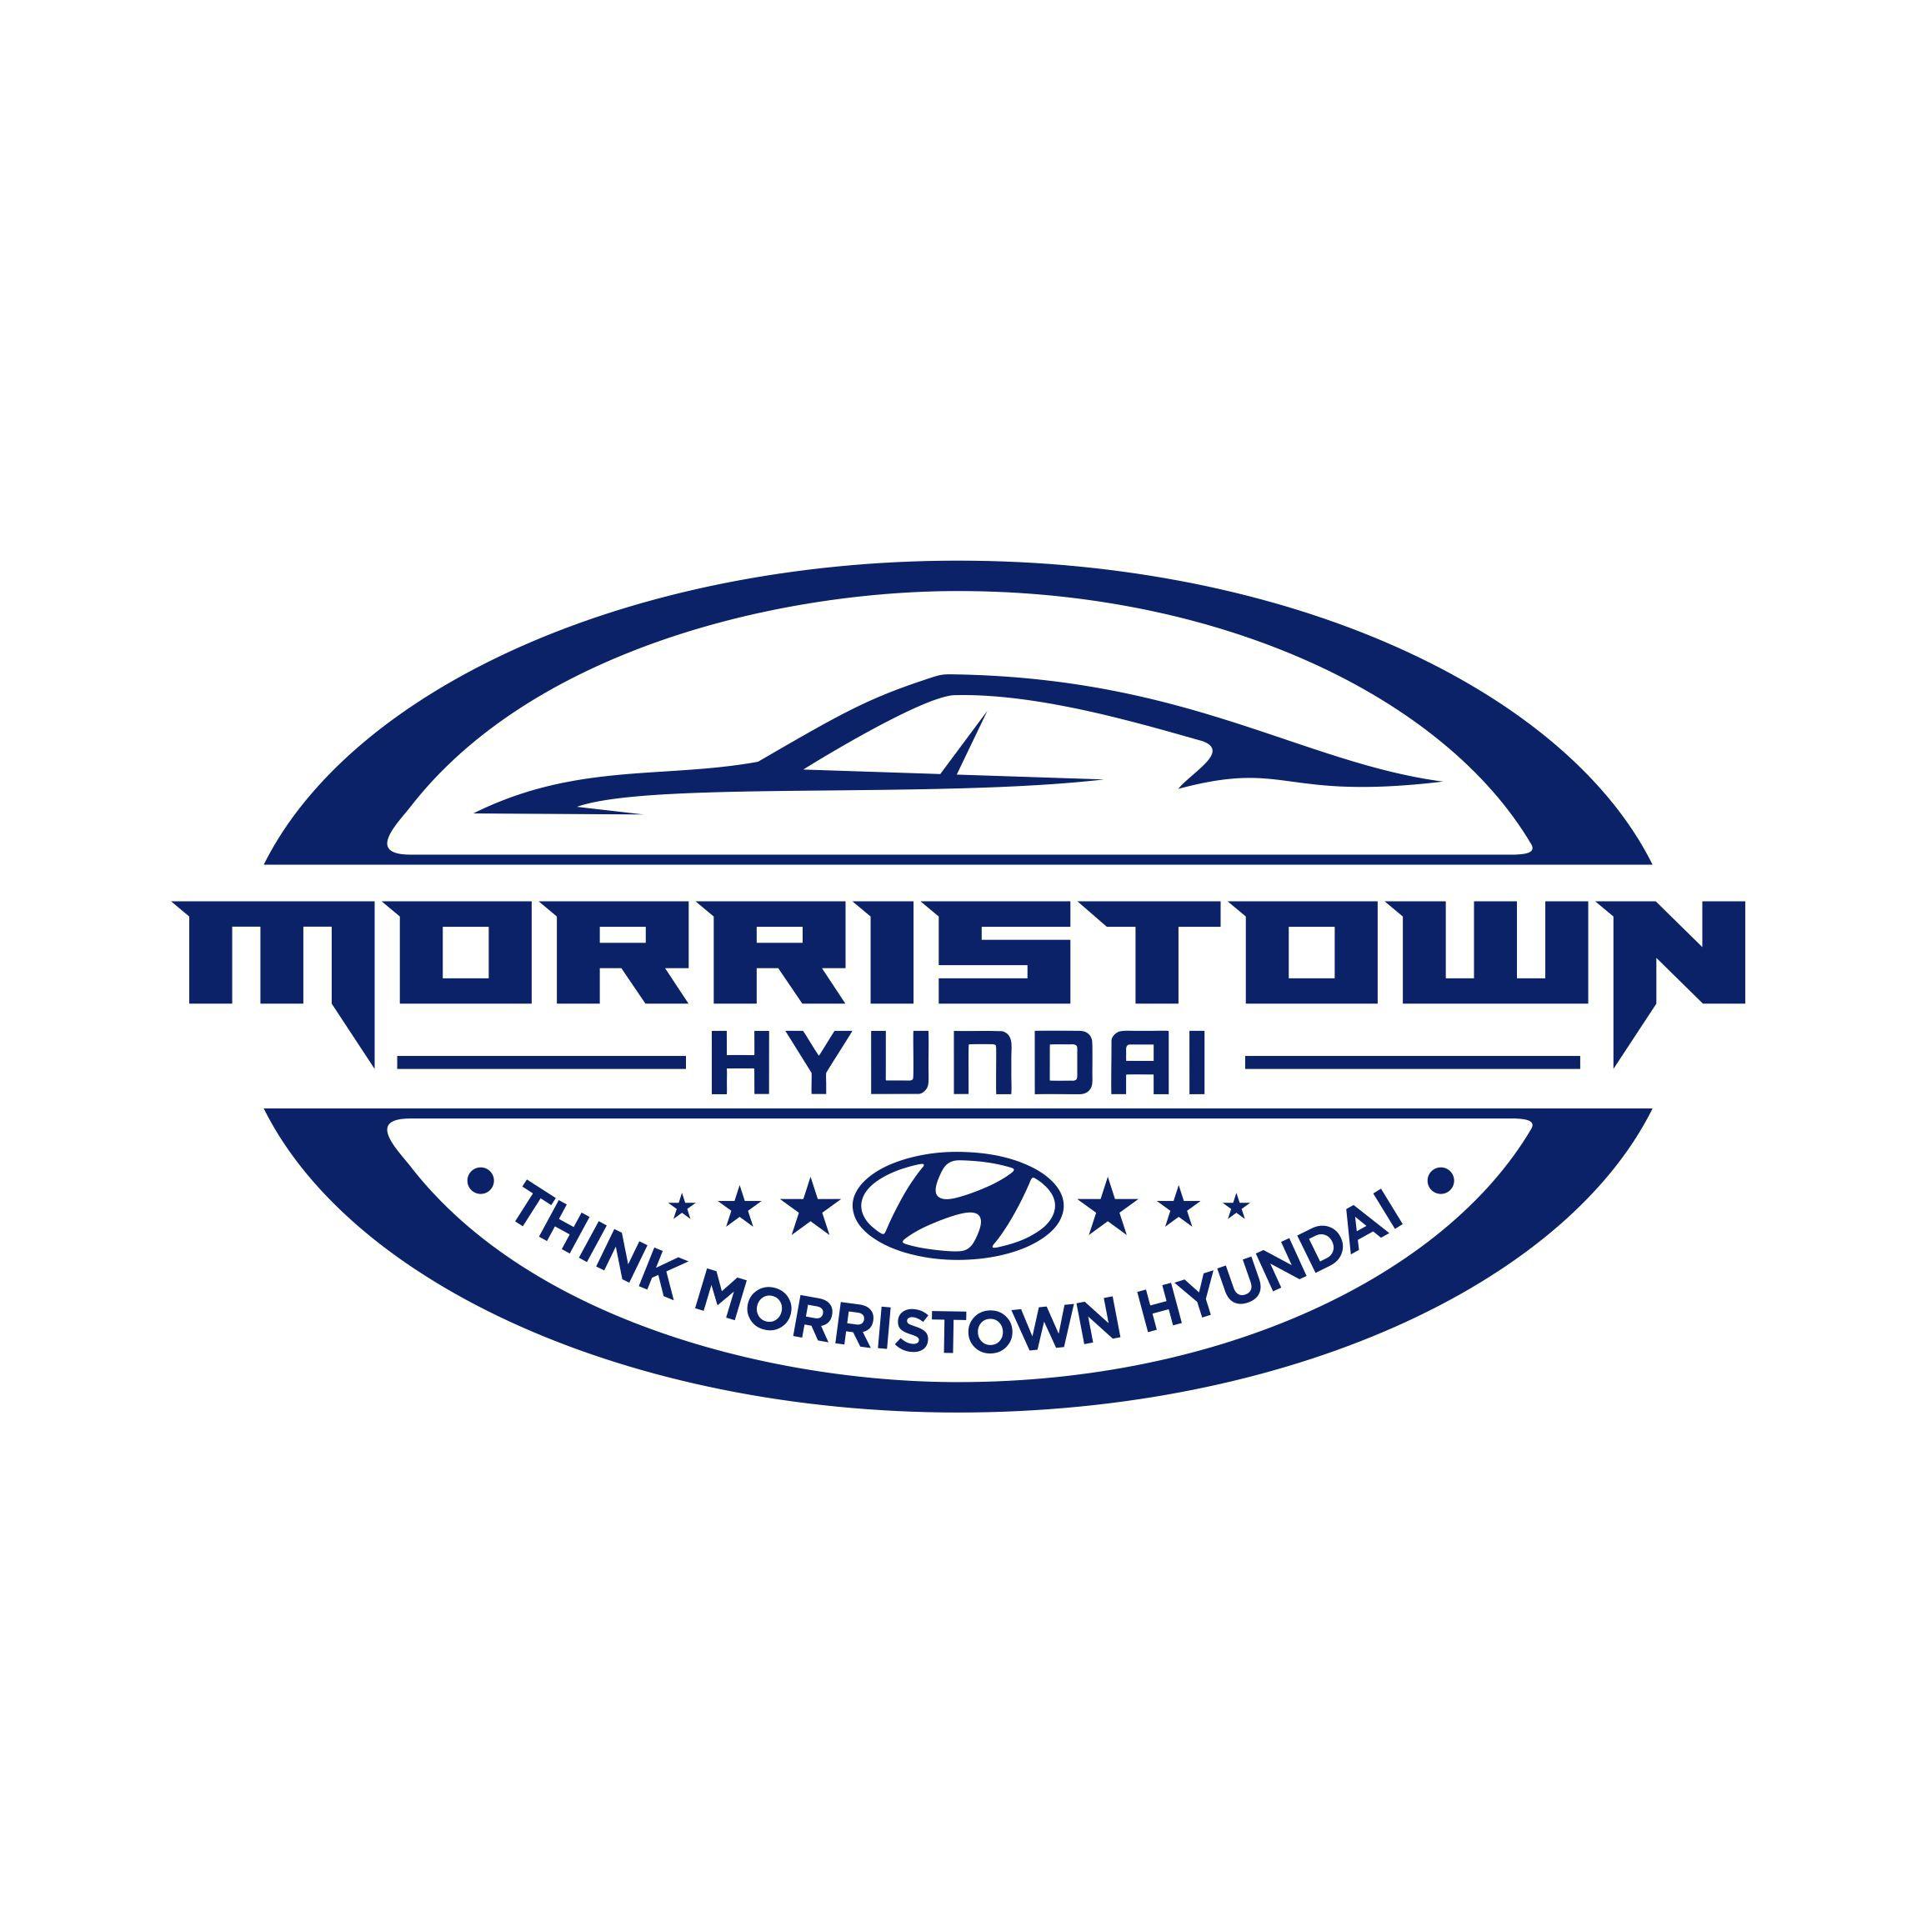 Design the Think Morristown Hyundai Logo